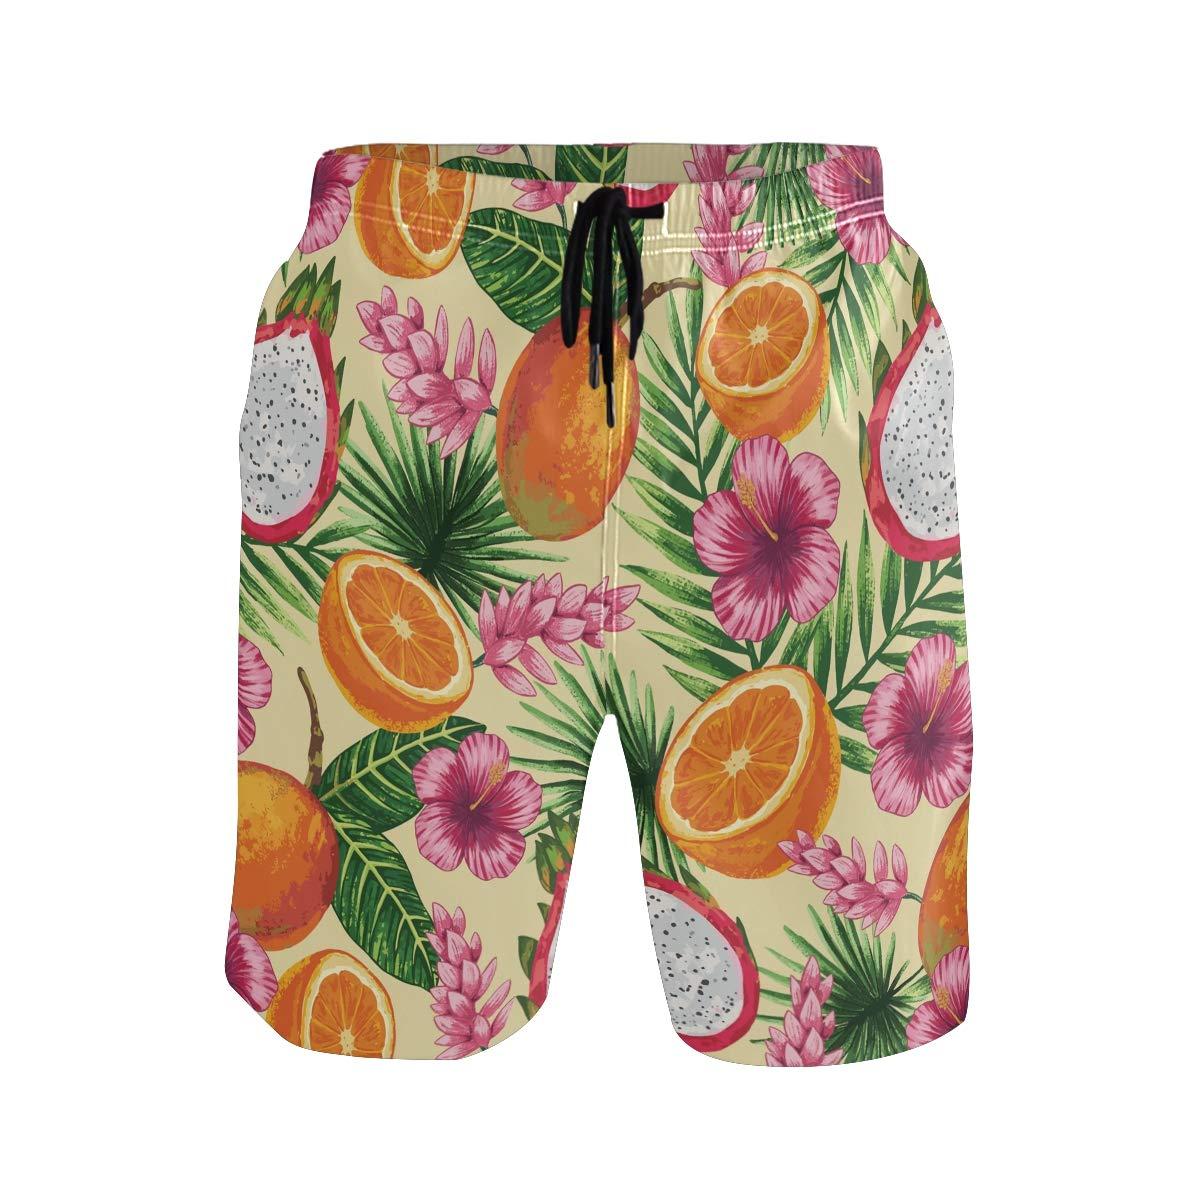 Mens Swim Trunks Tropical Flower Dragon Fruit Orange Beach Board Shorts